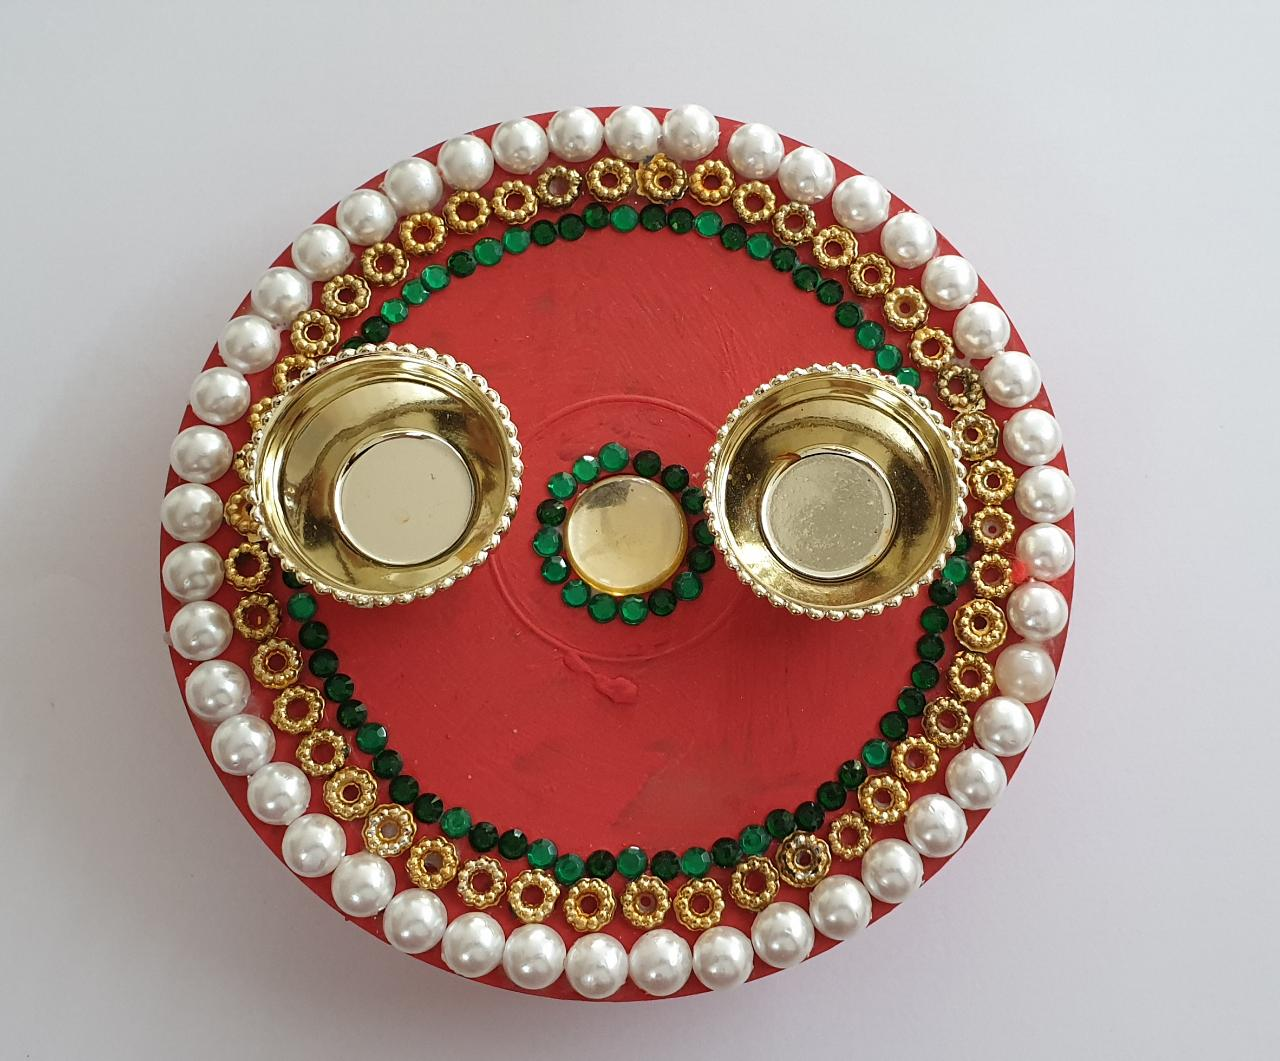 Diwali Hamper (Kumkum Chokha Plate, 2 Diyas, Roasted Almond, Roasted Cashew, Raisins) Slider Thumbnail 2/4